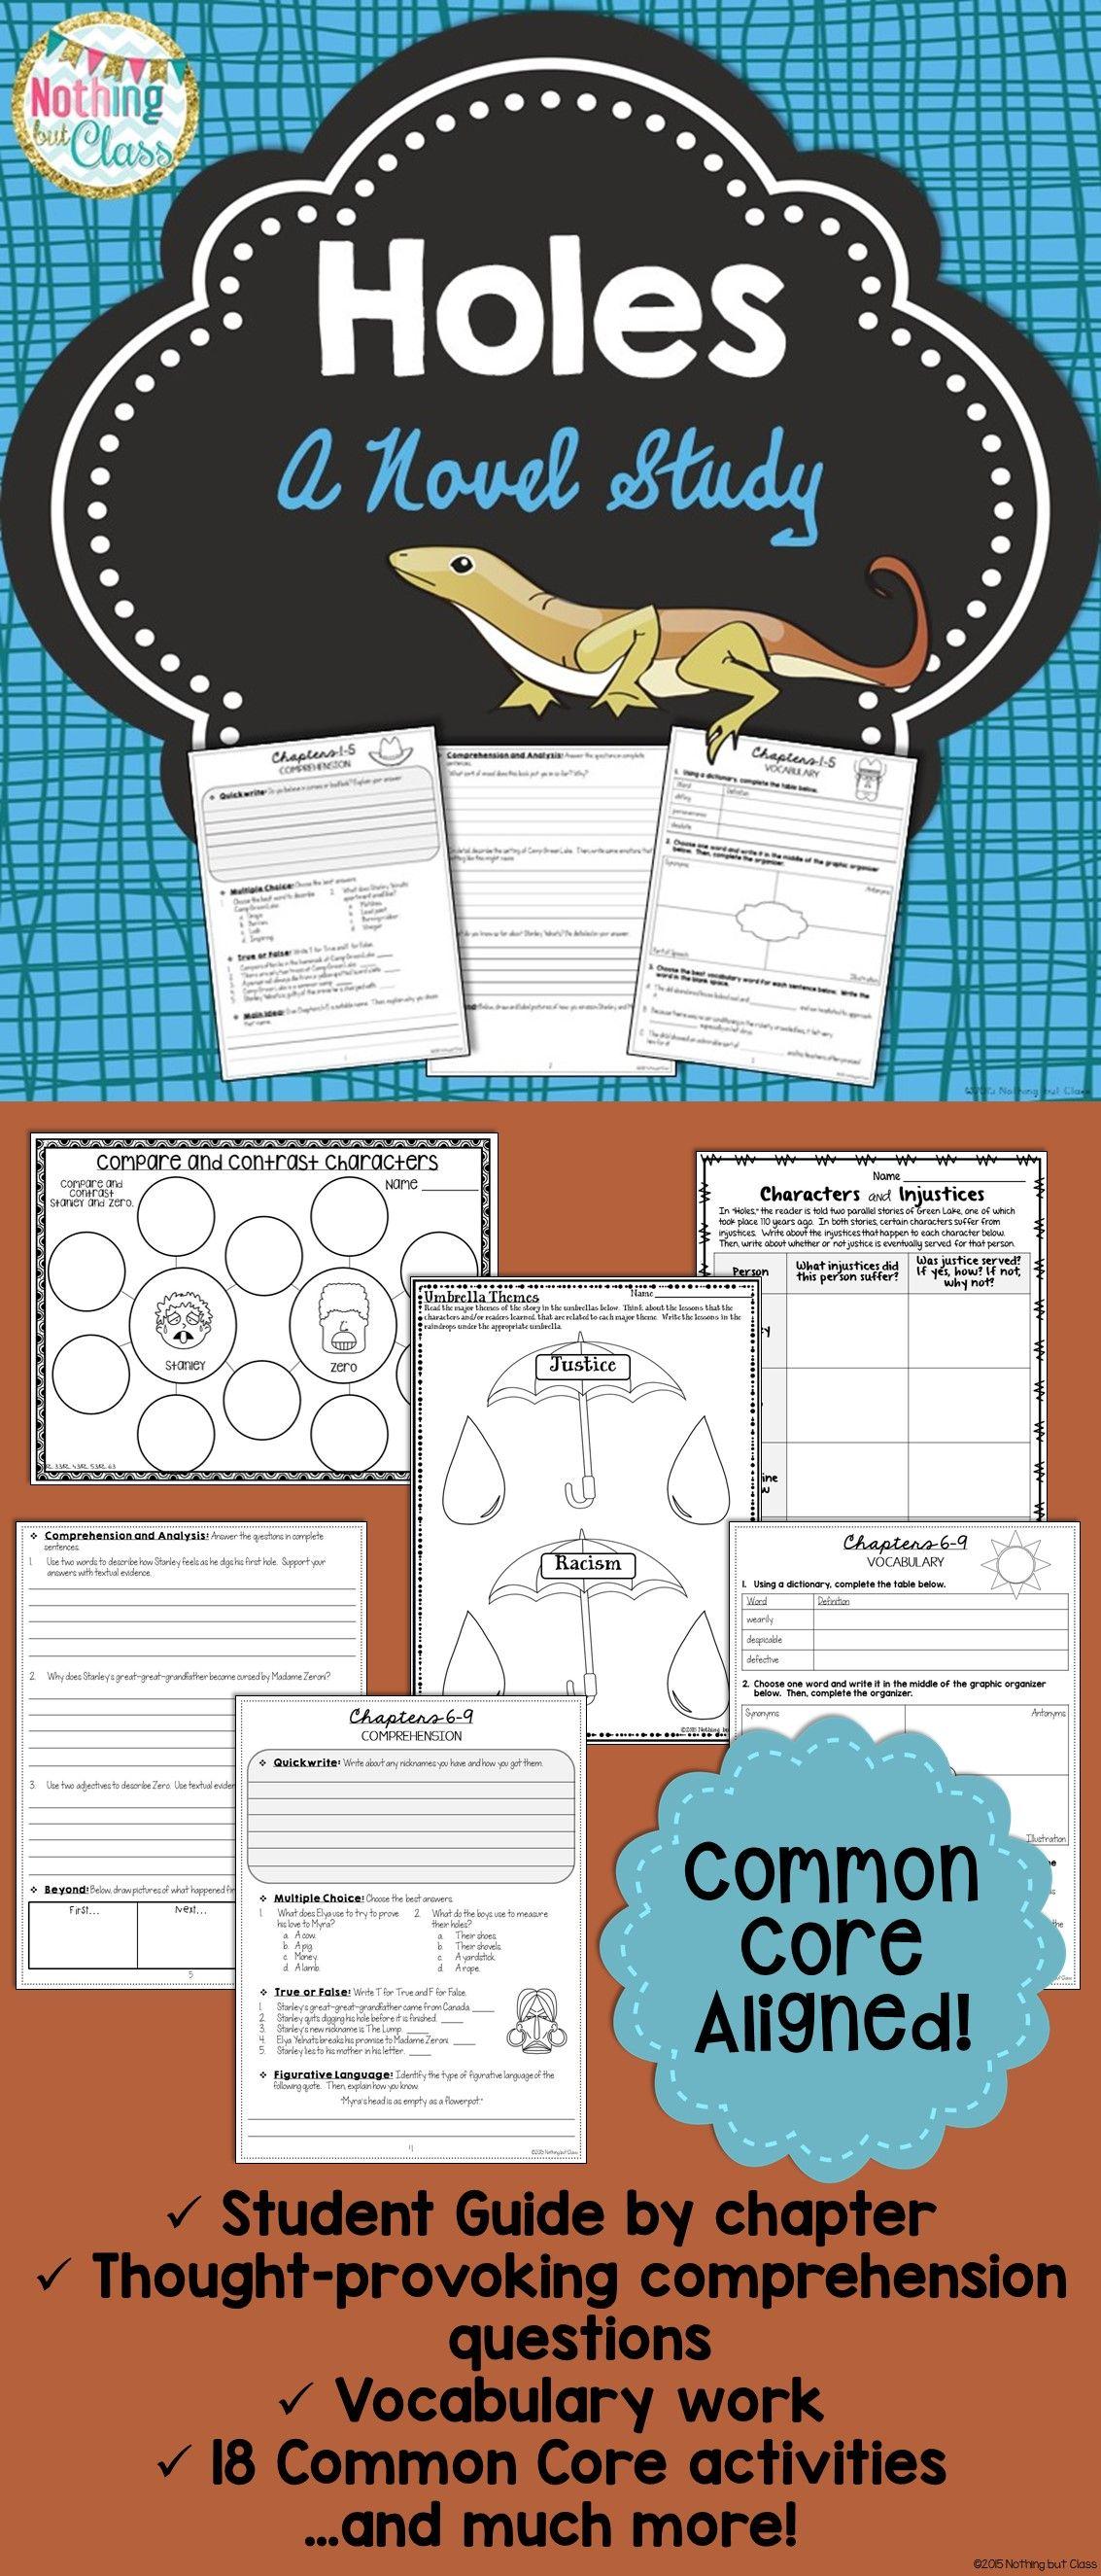 Holes Novel Study Unit Comprehension Vocabulary Activities Tests